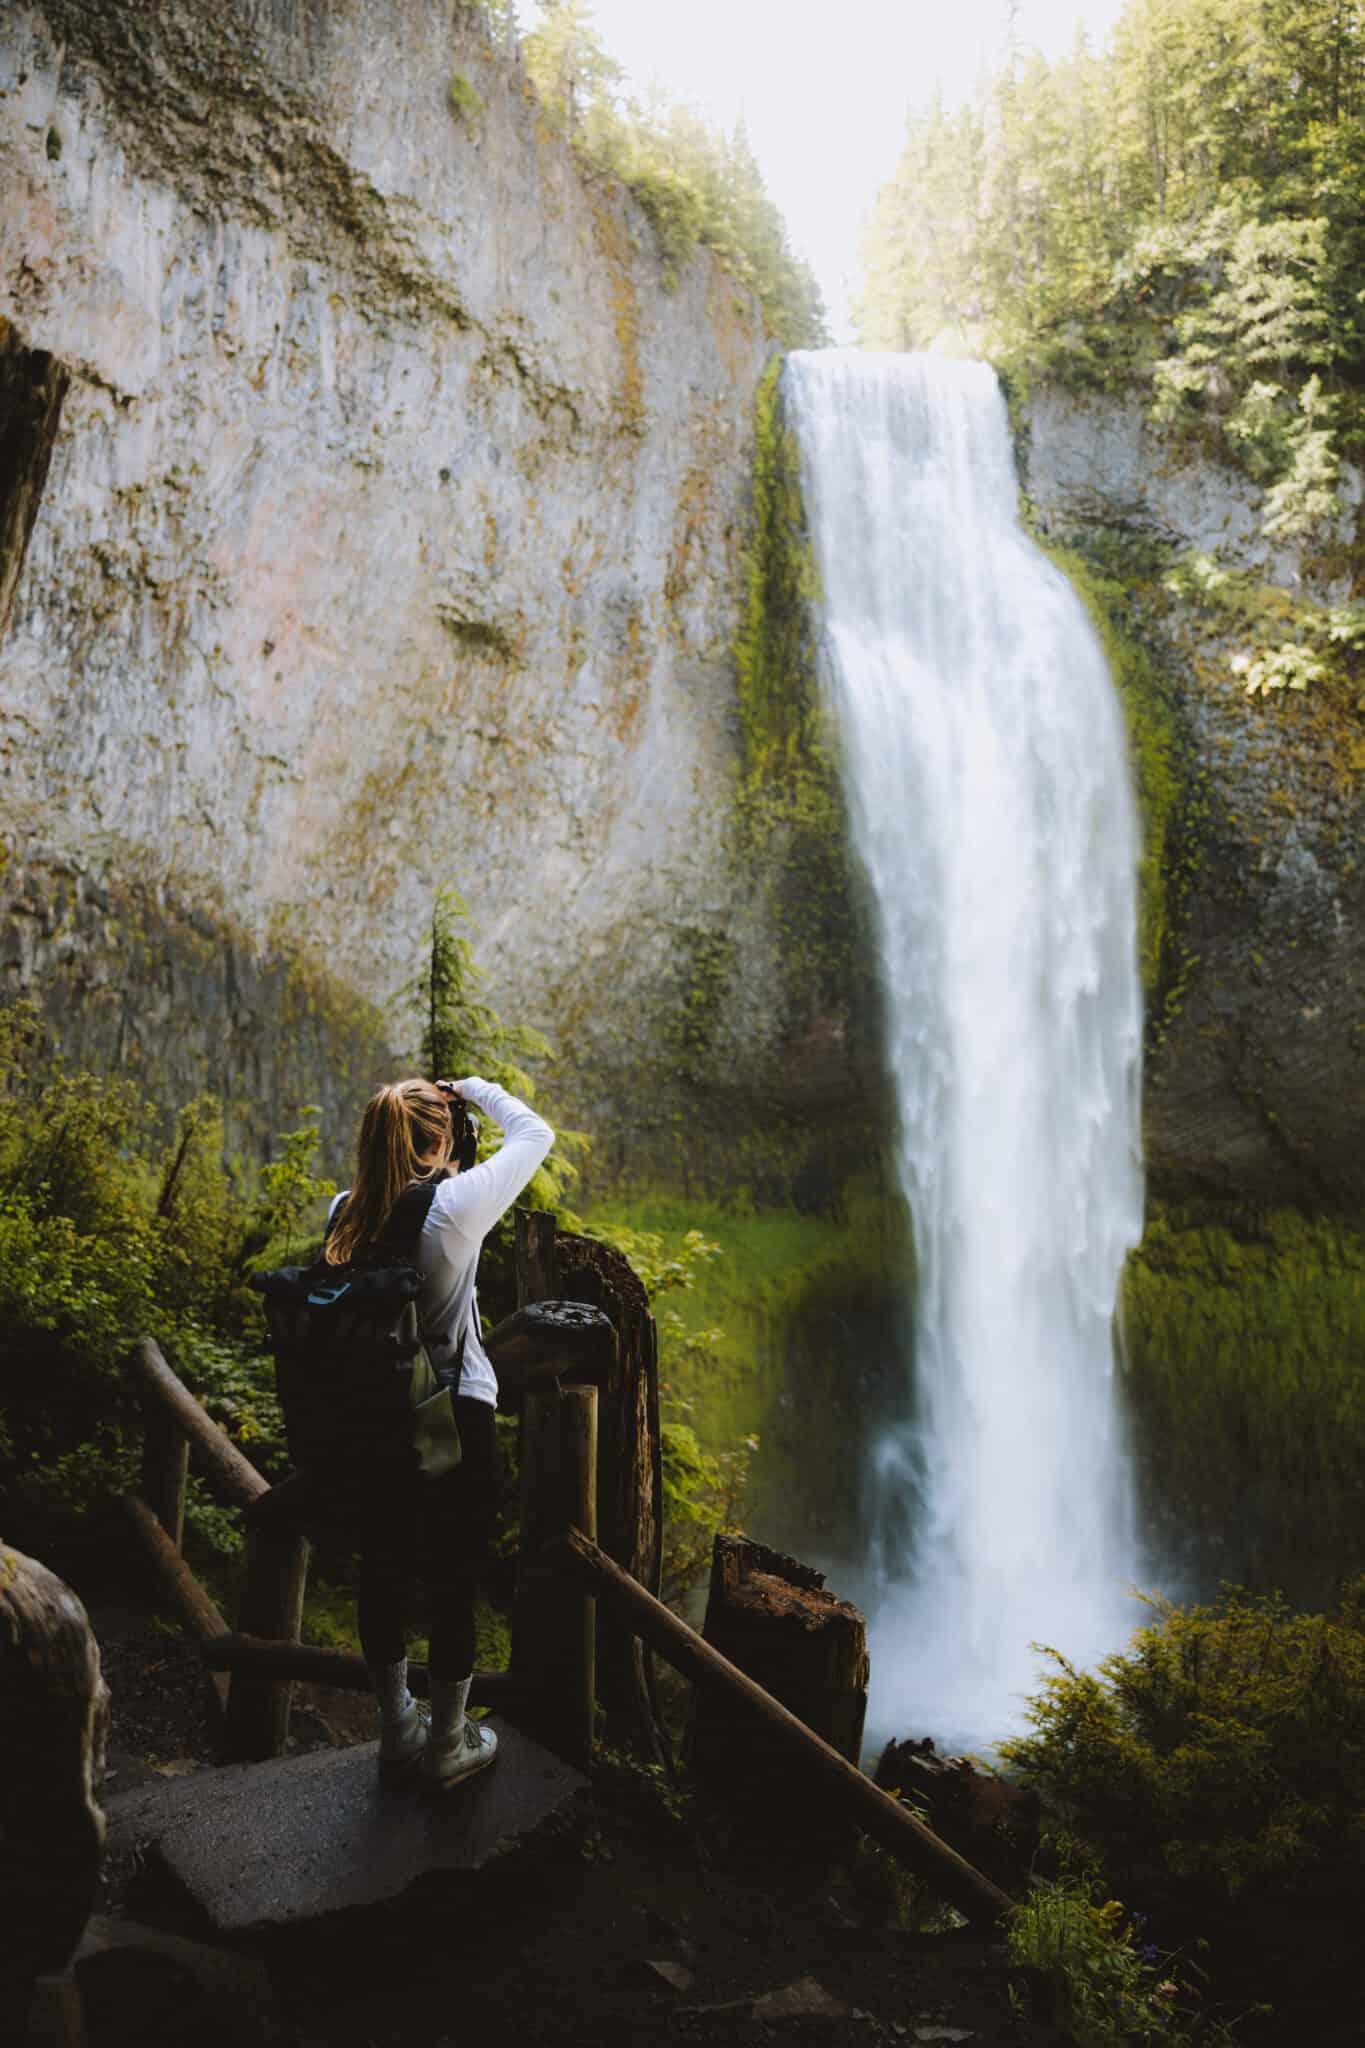 Emily taking a photo of Salt Creek Falls